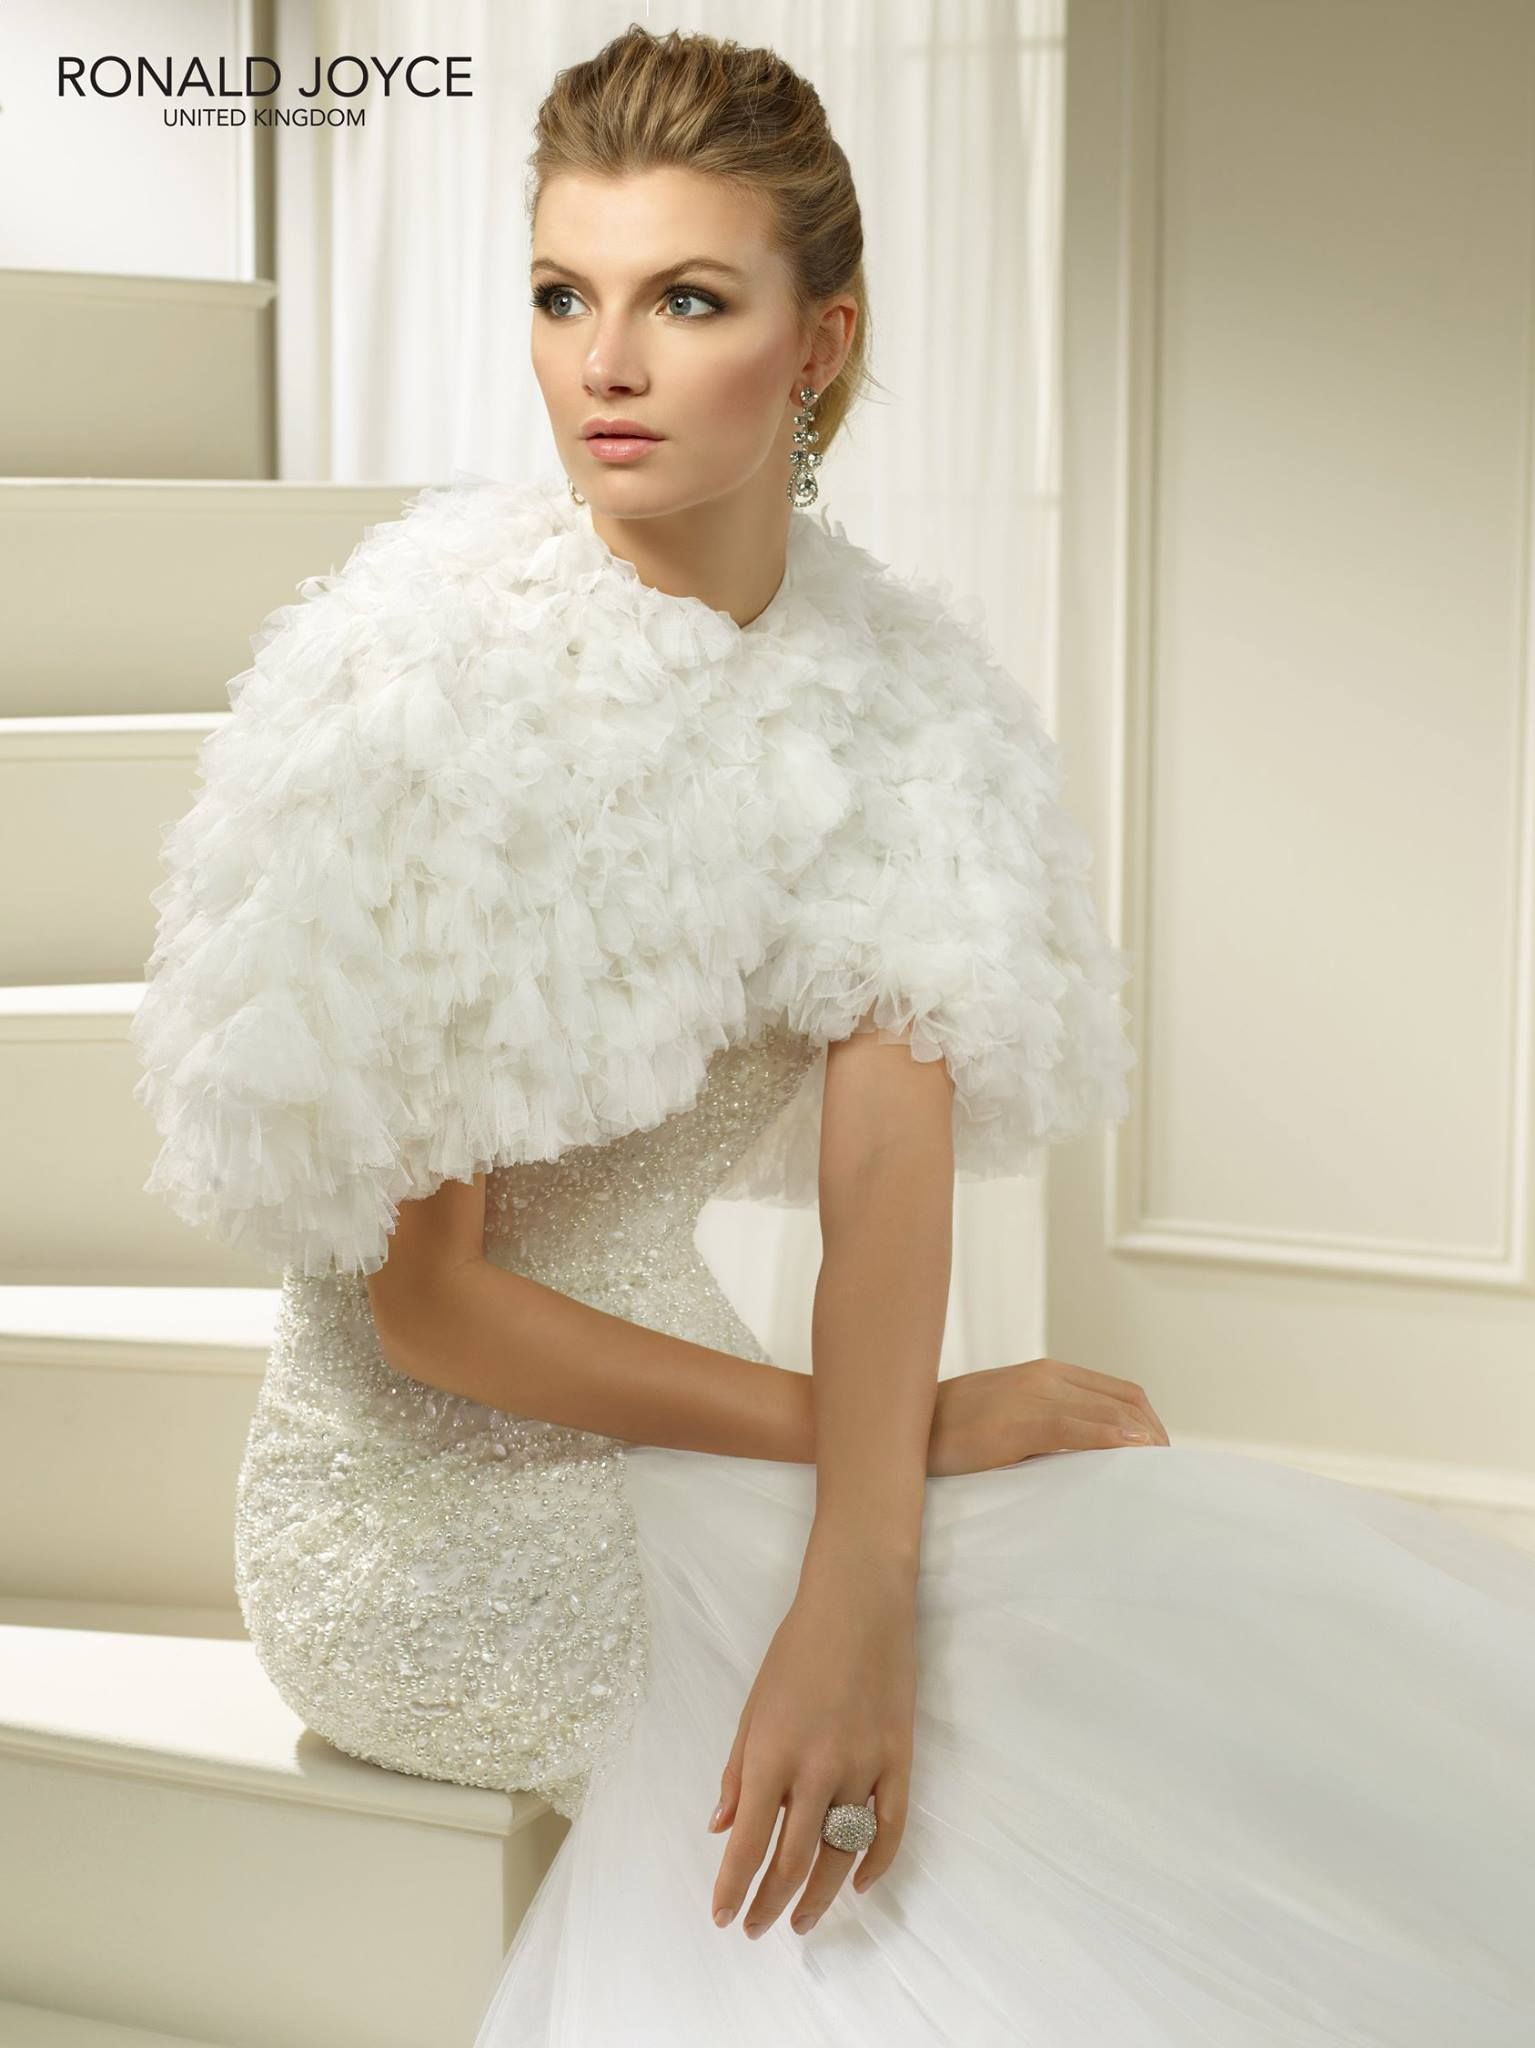 69227 Ronald Joyce wedding dress shrug | Tis the season to get ...